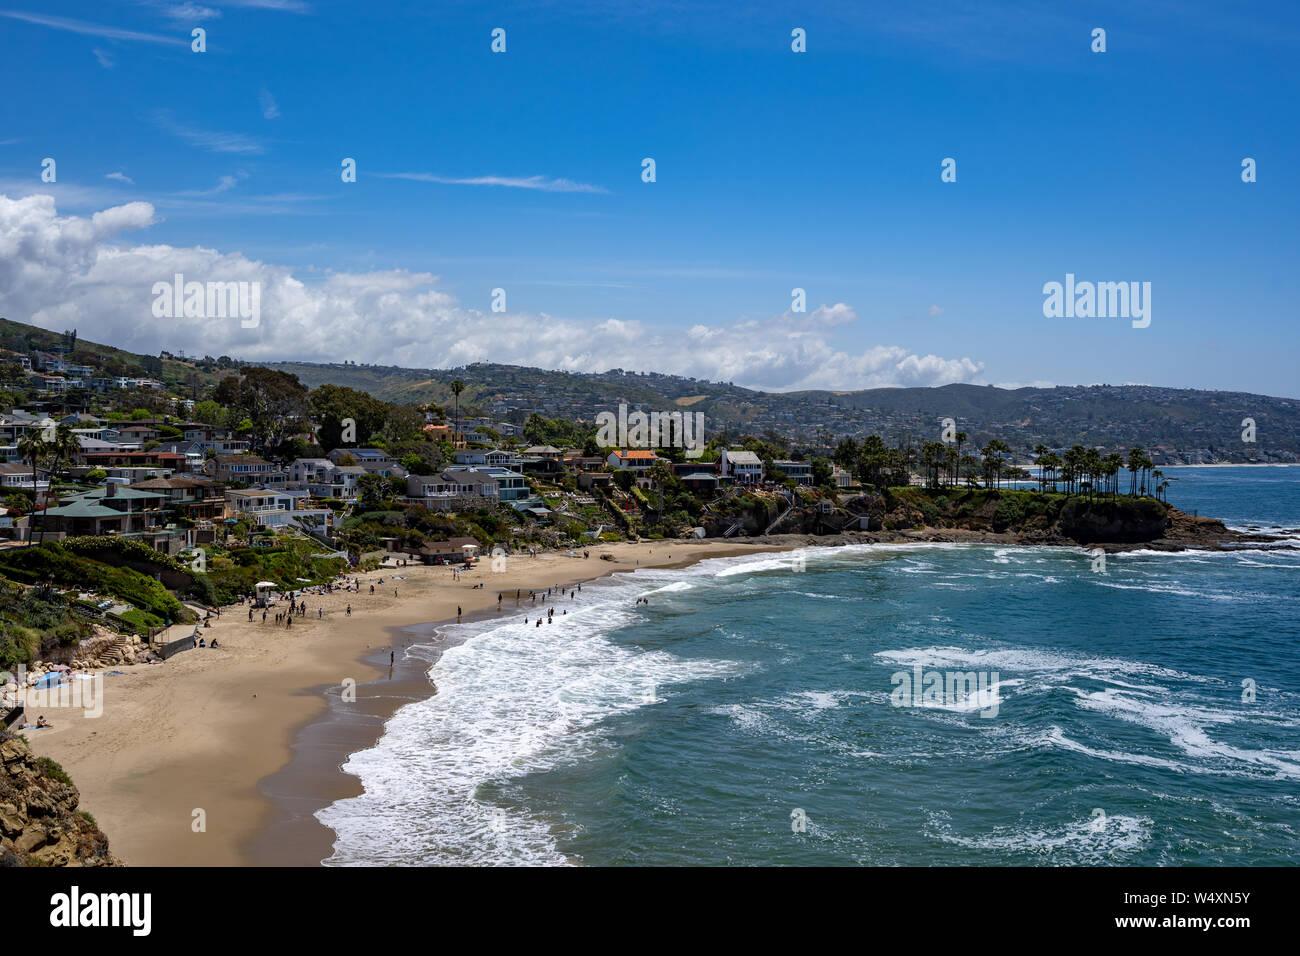 Idyllic view in Laguna Beach, California, USA Stock Photo